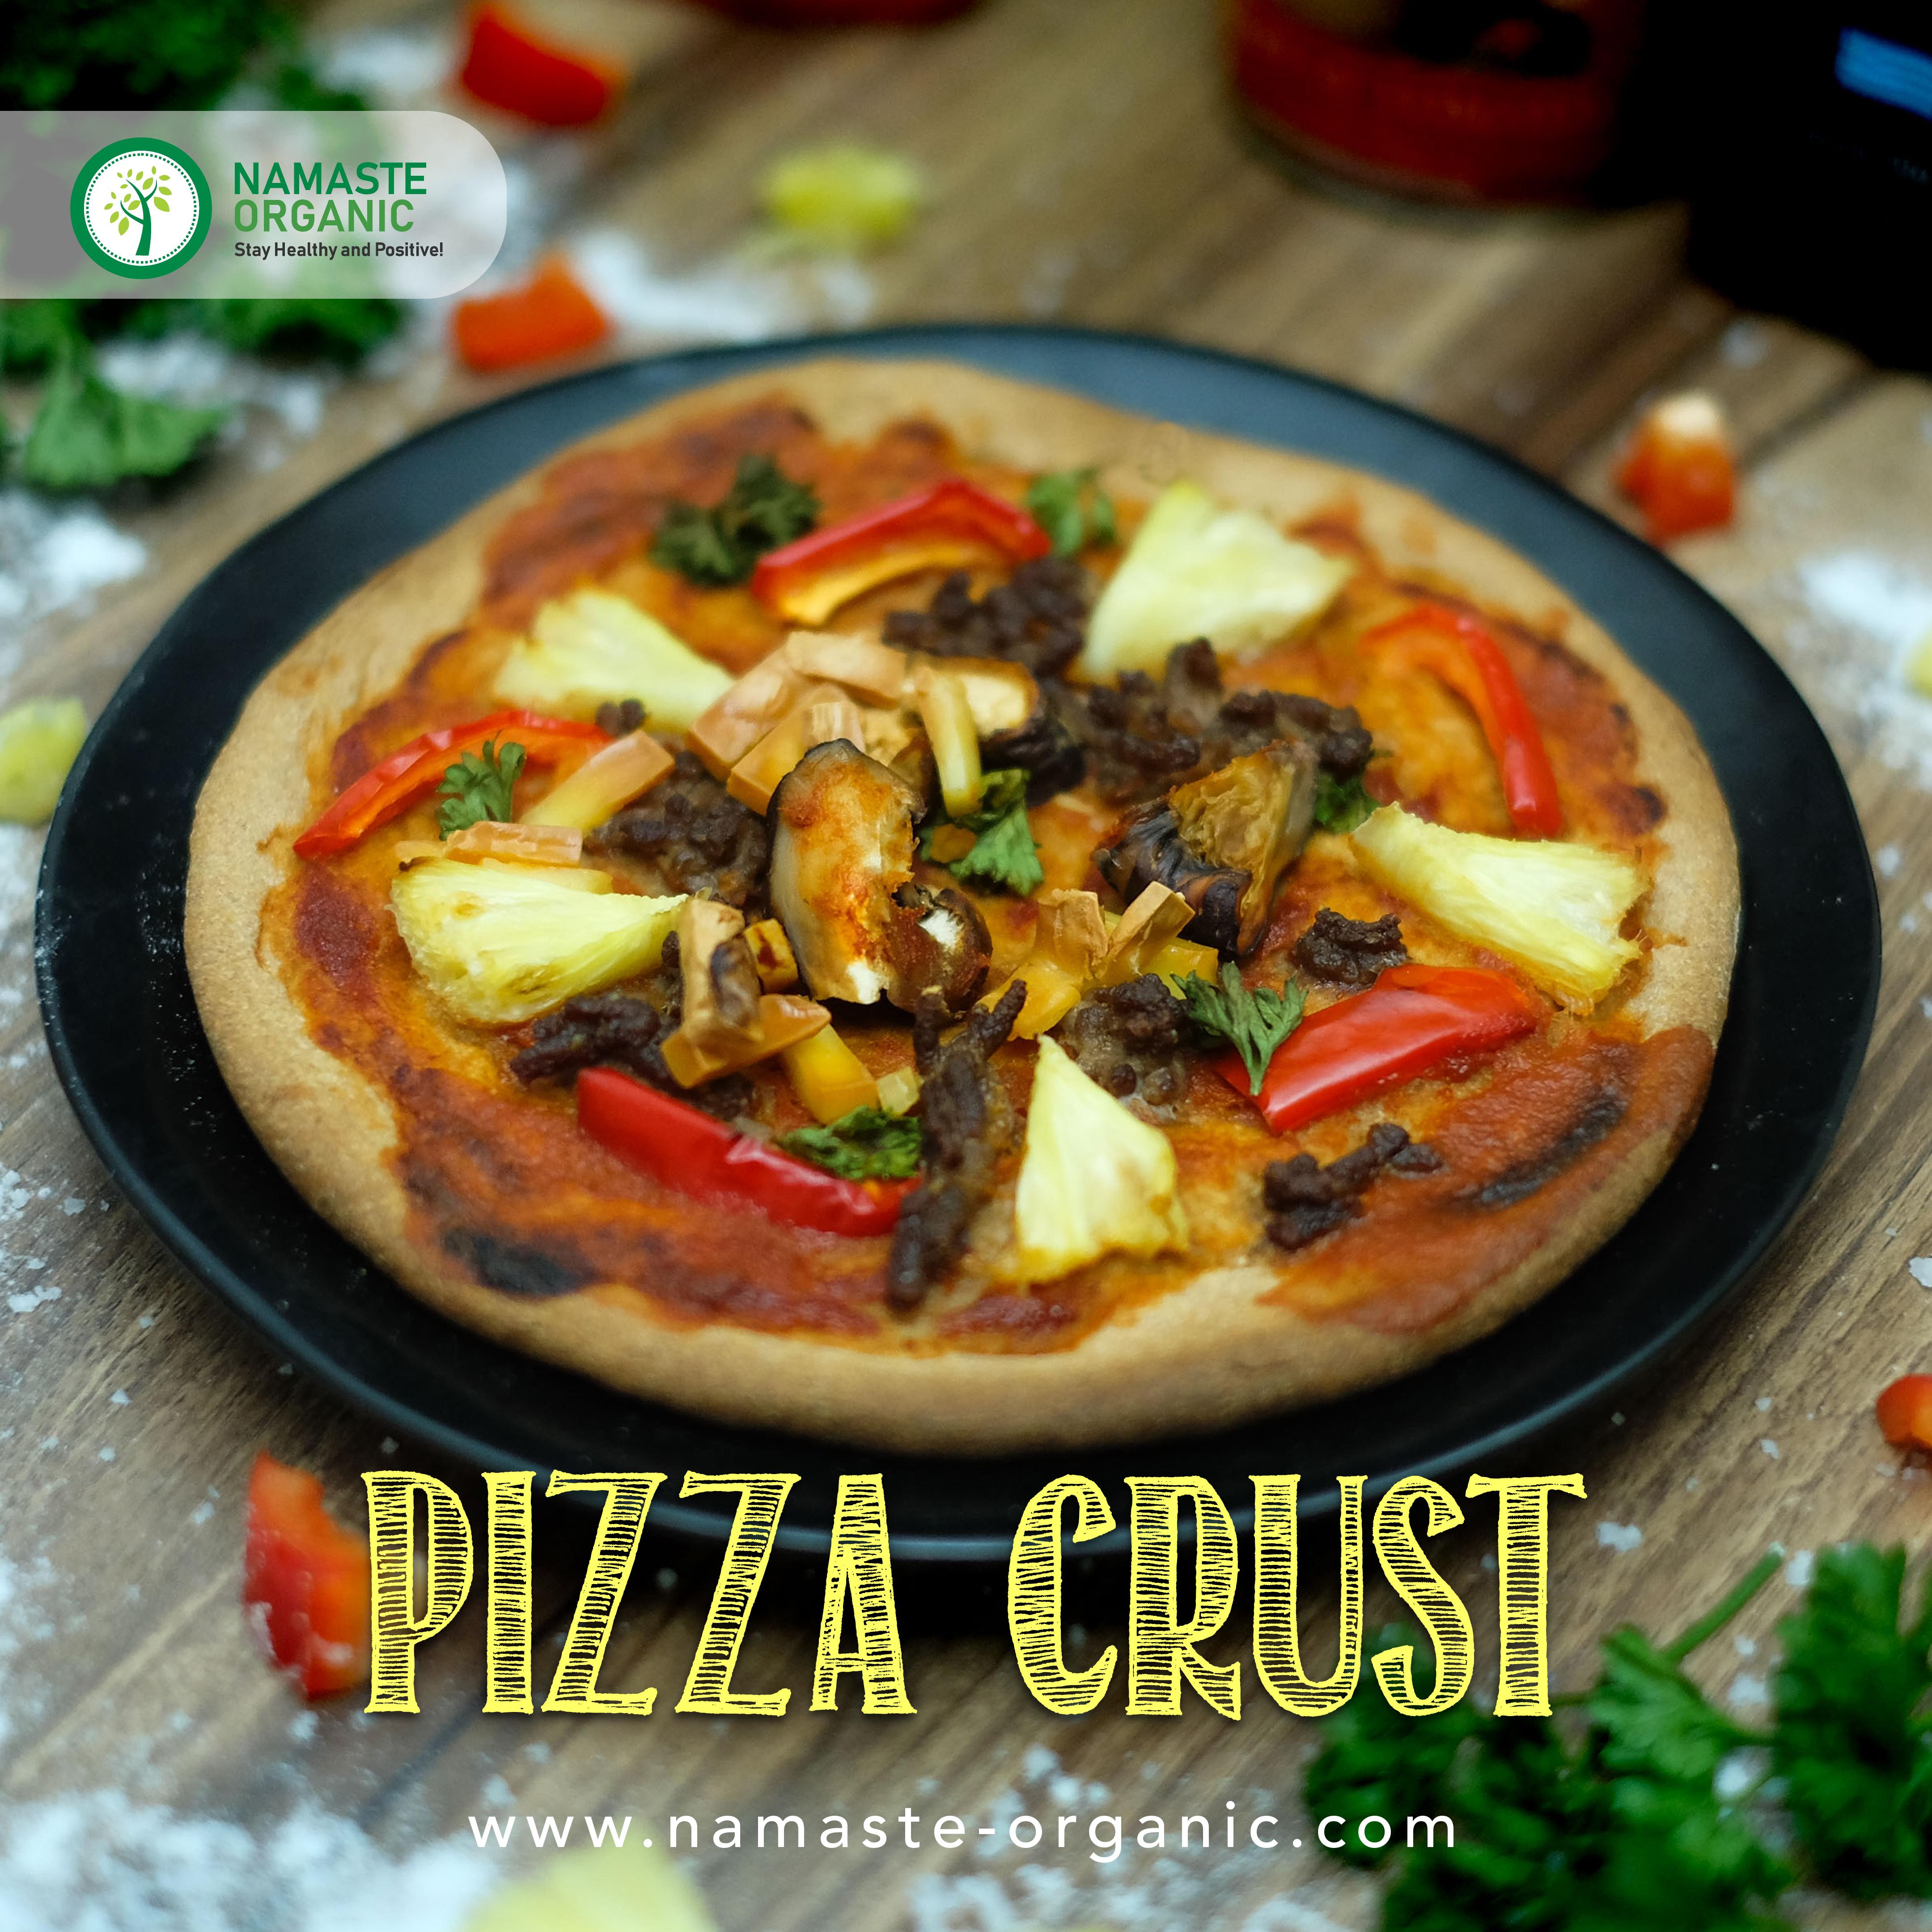 PIZZA CRUSH image